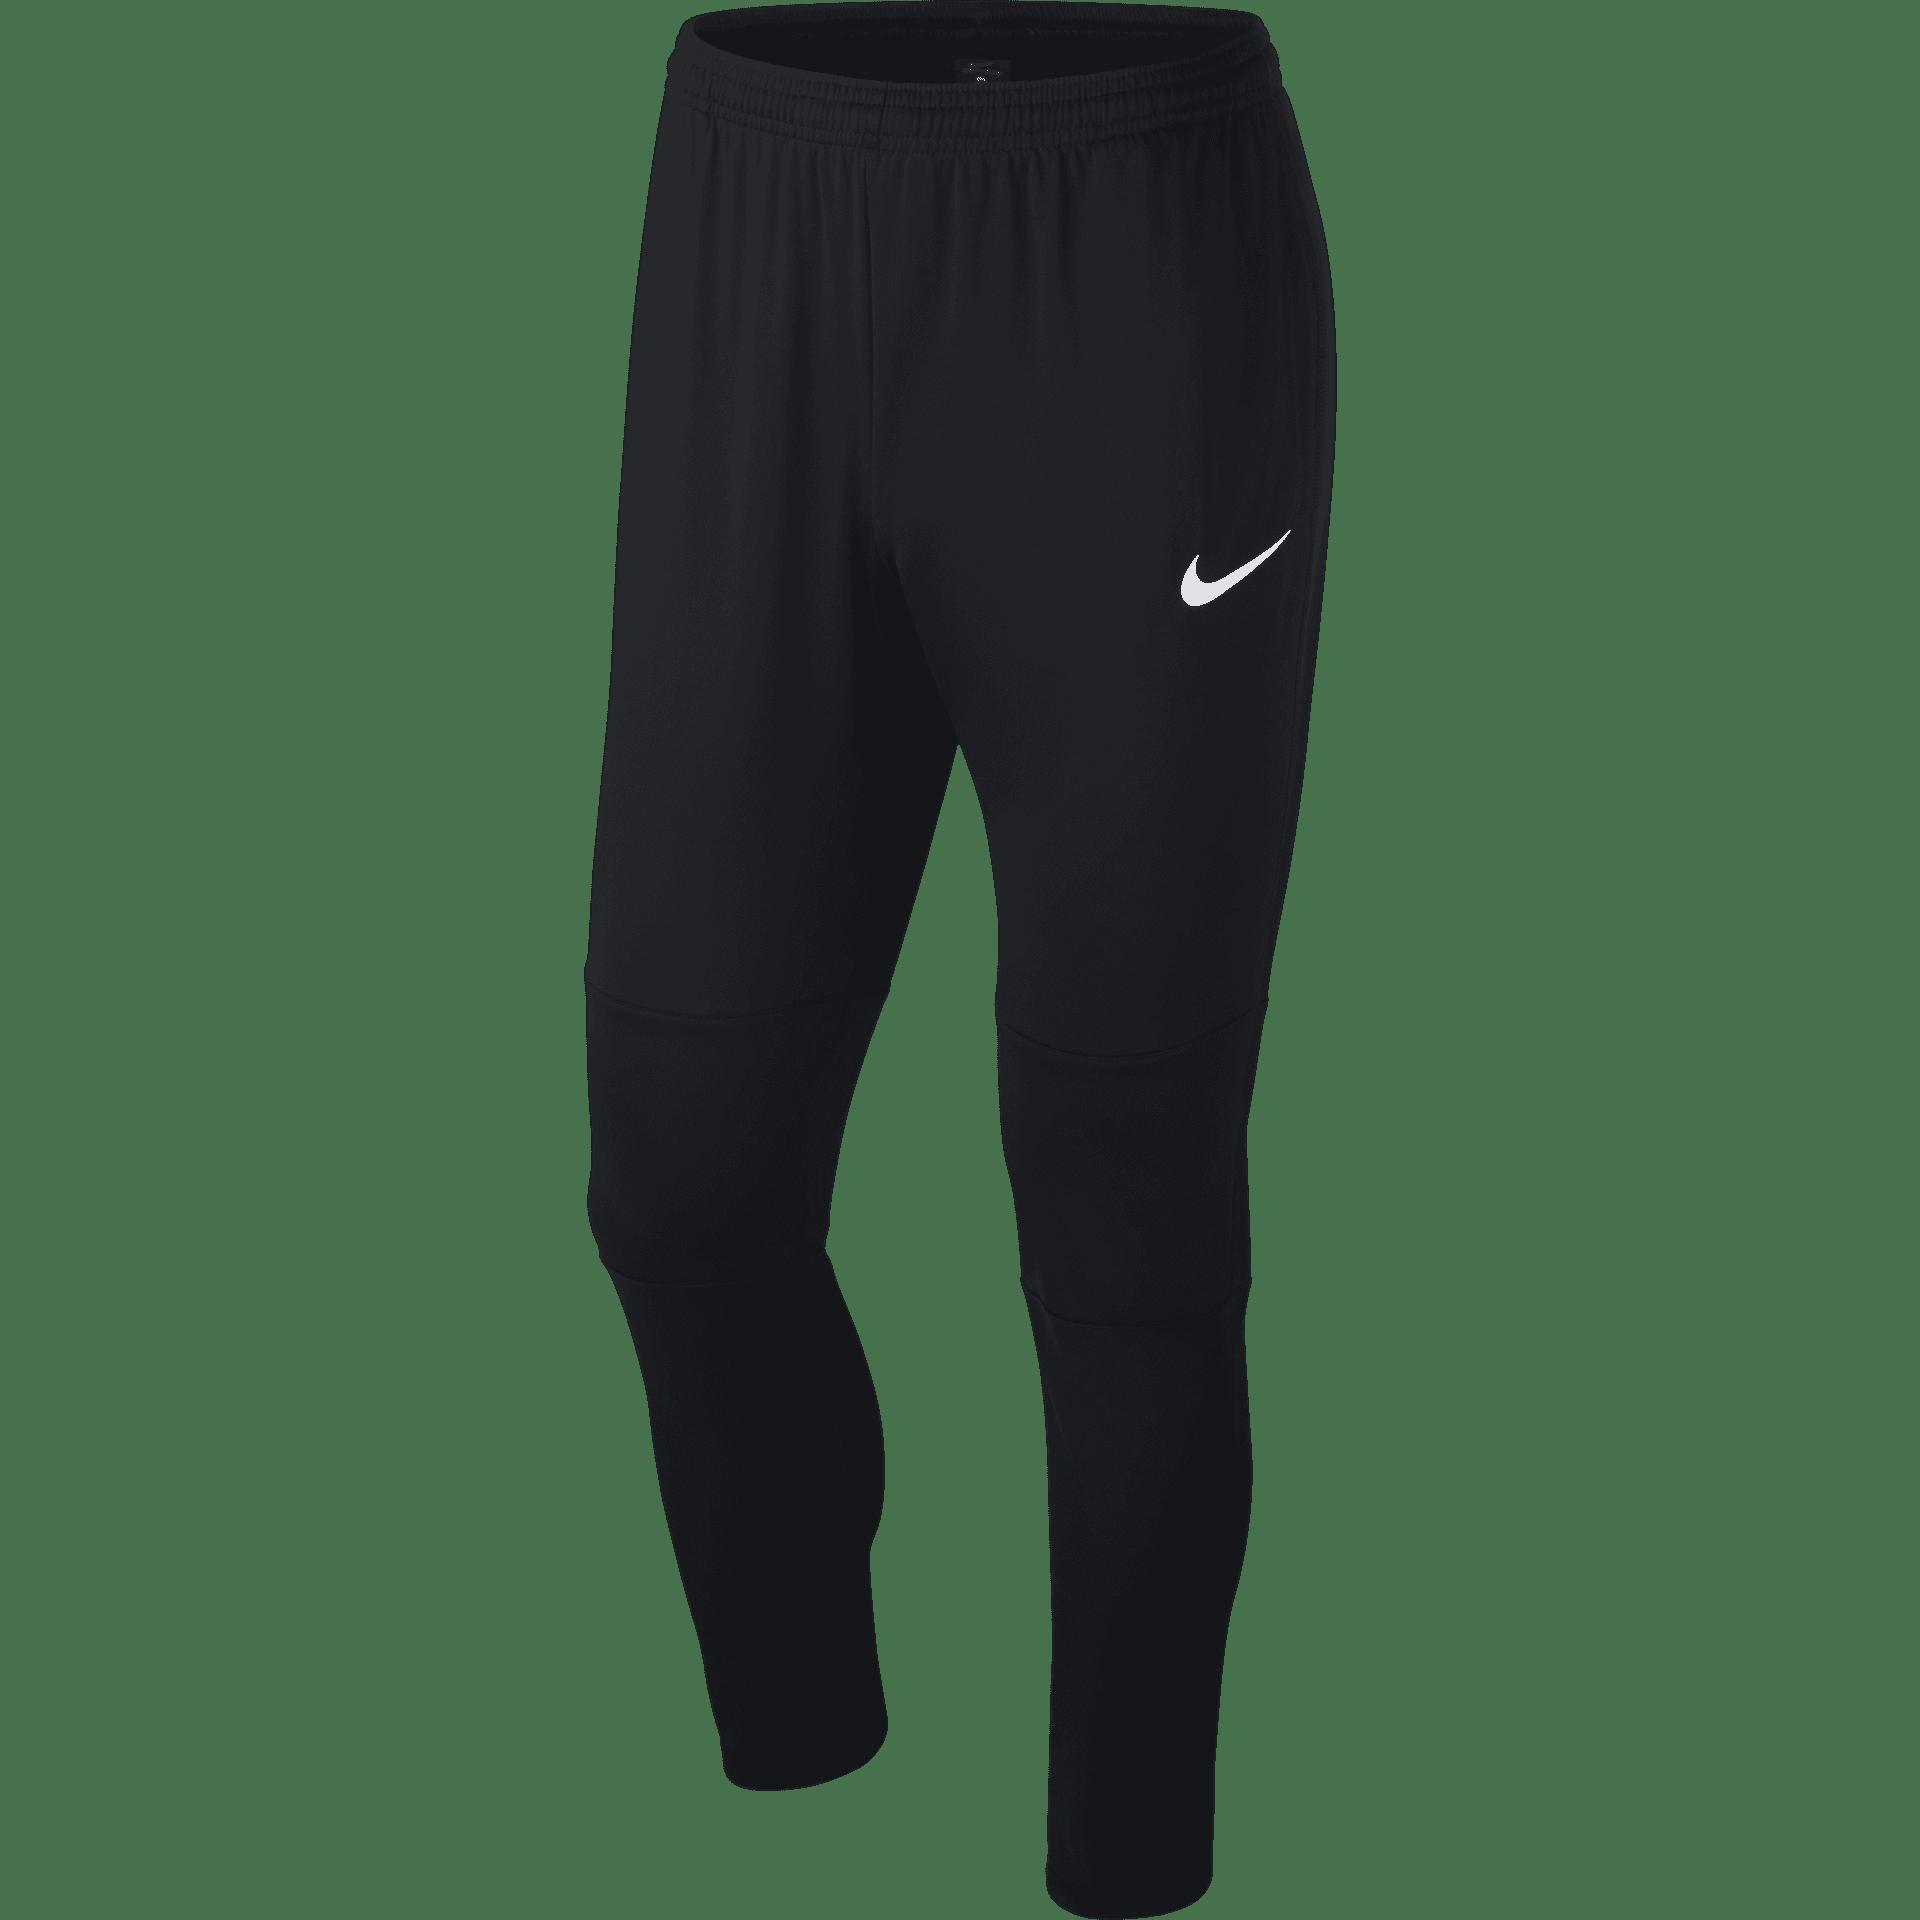 Fivemiletown utd skinny pants